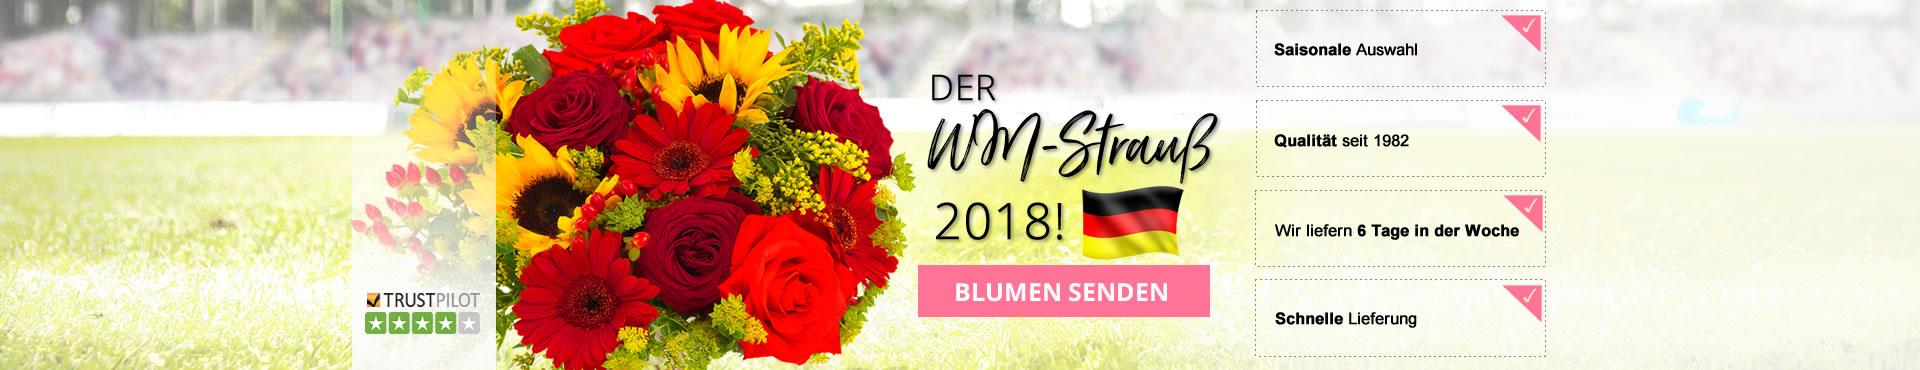 WM-Strauß